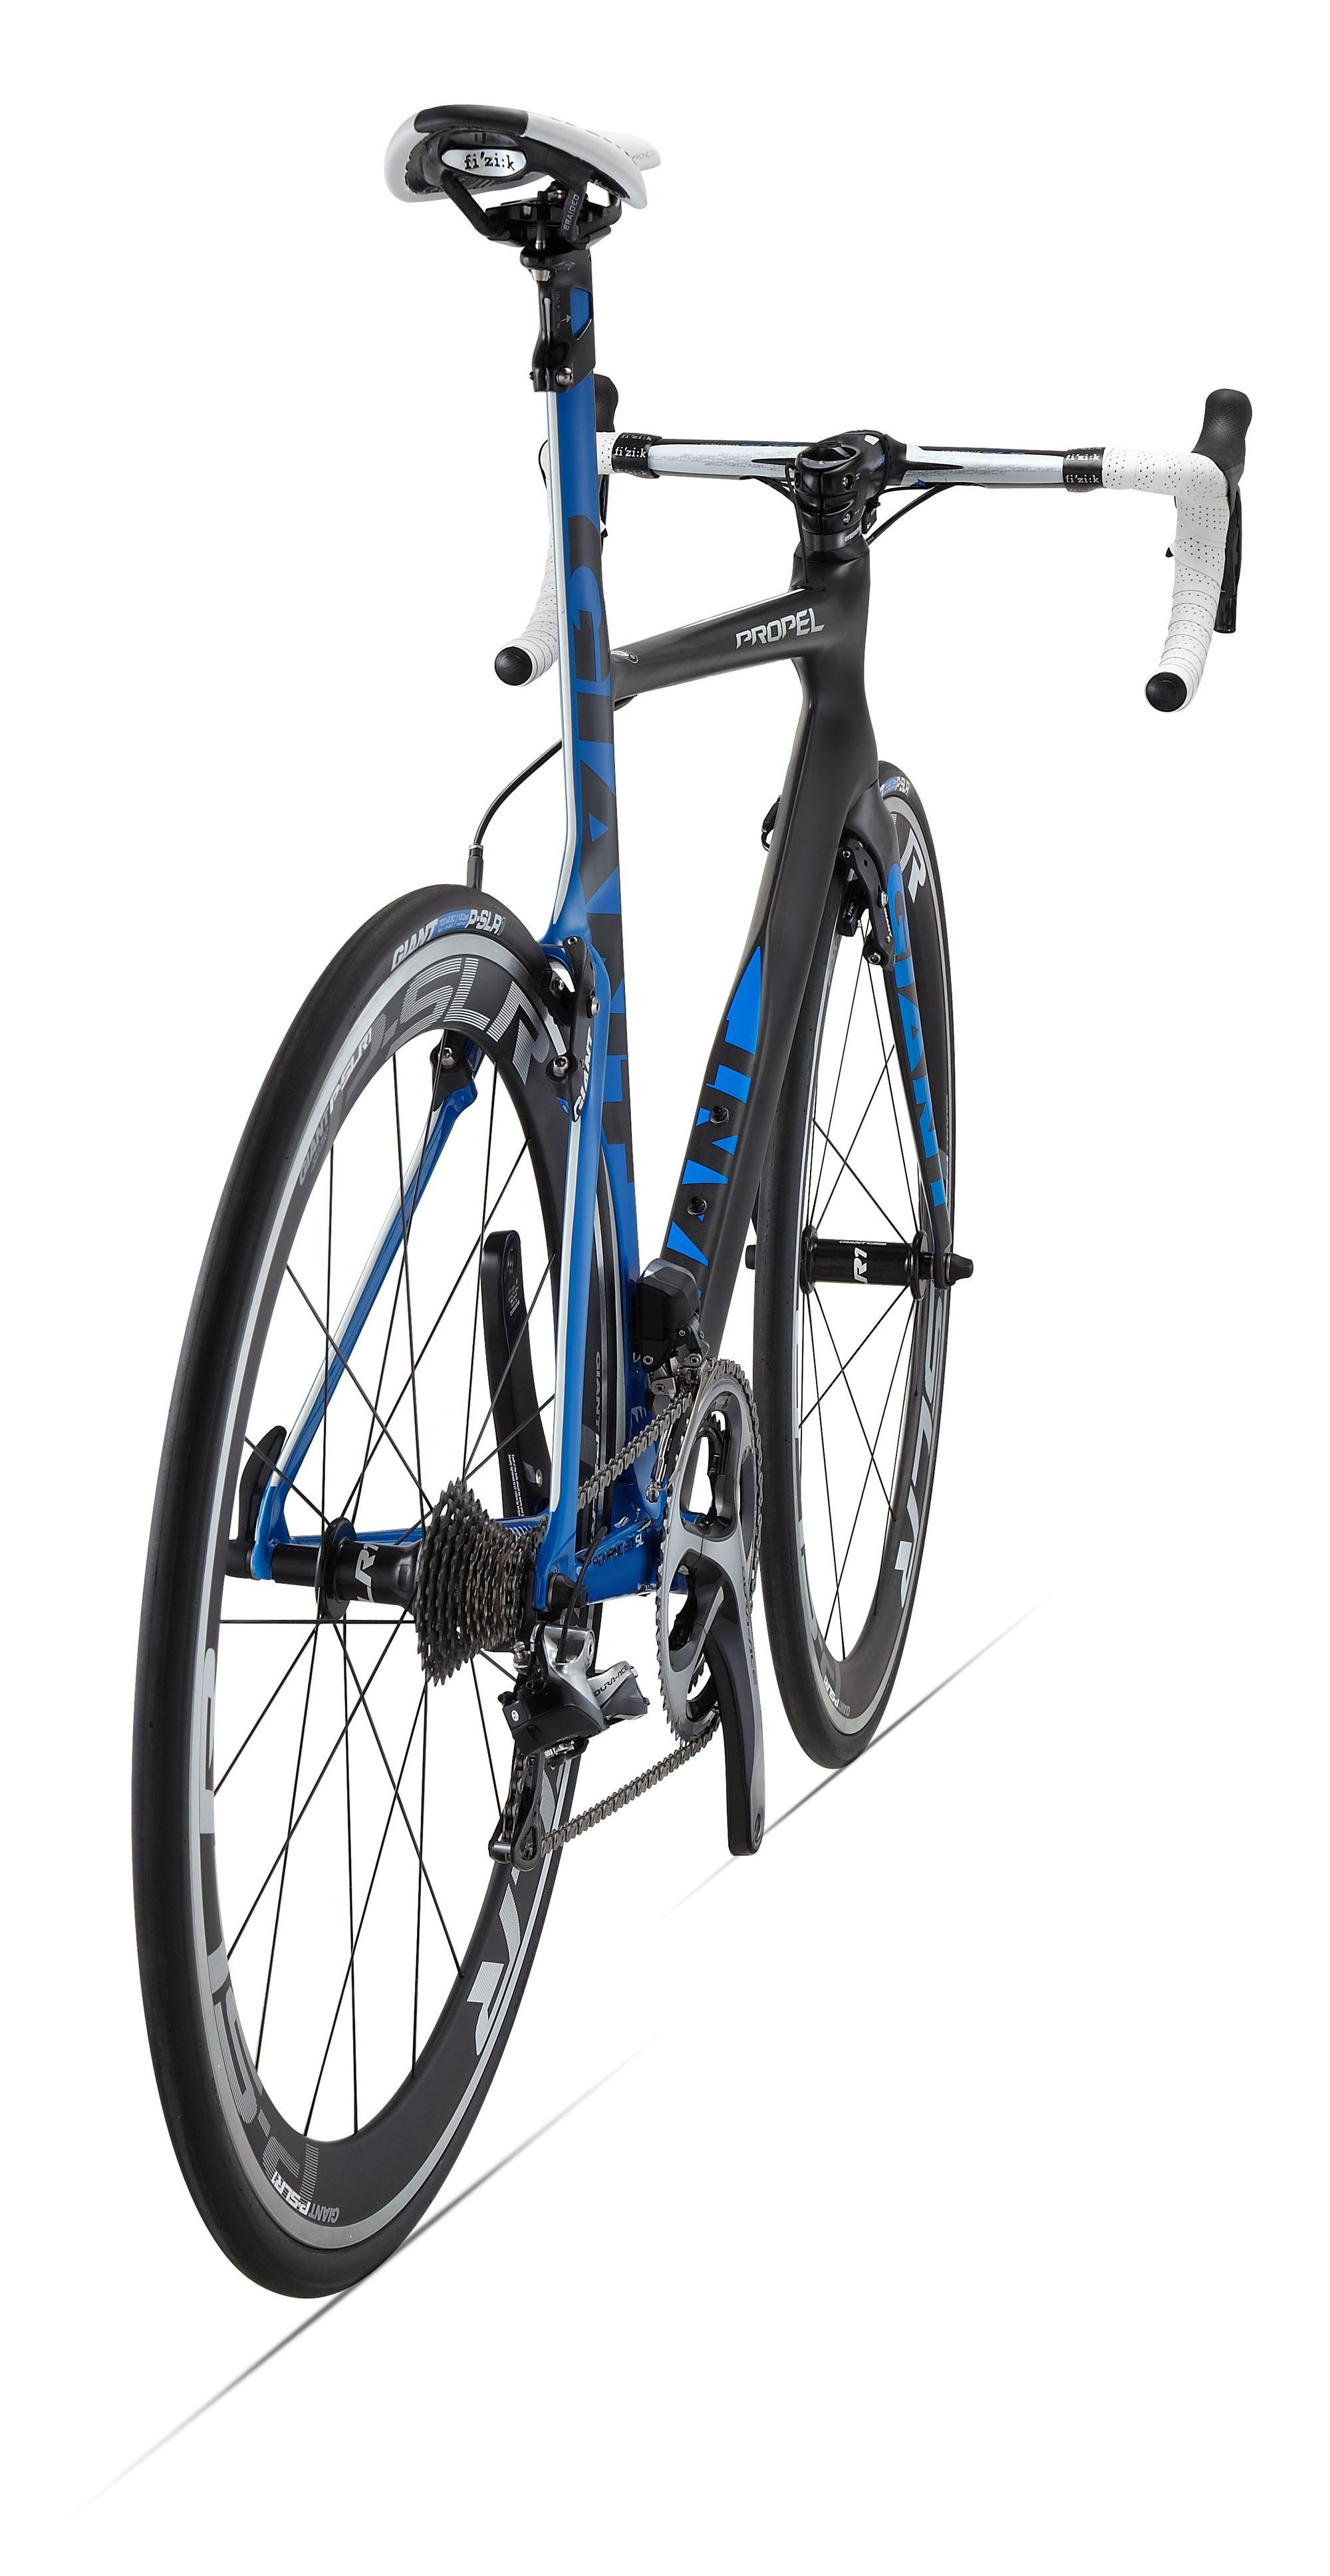 Propel Advanced Sl 0 2013 Gamma Biciclette Giant Ride Life